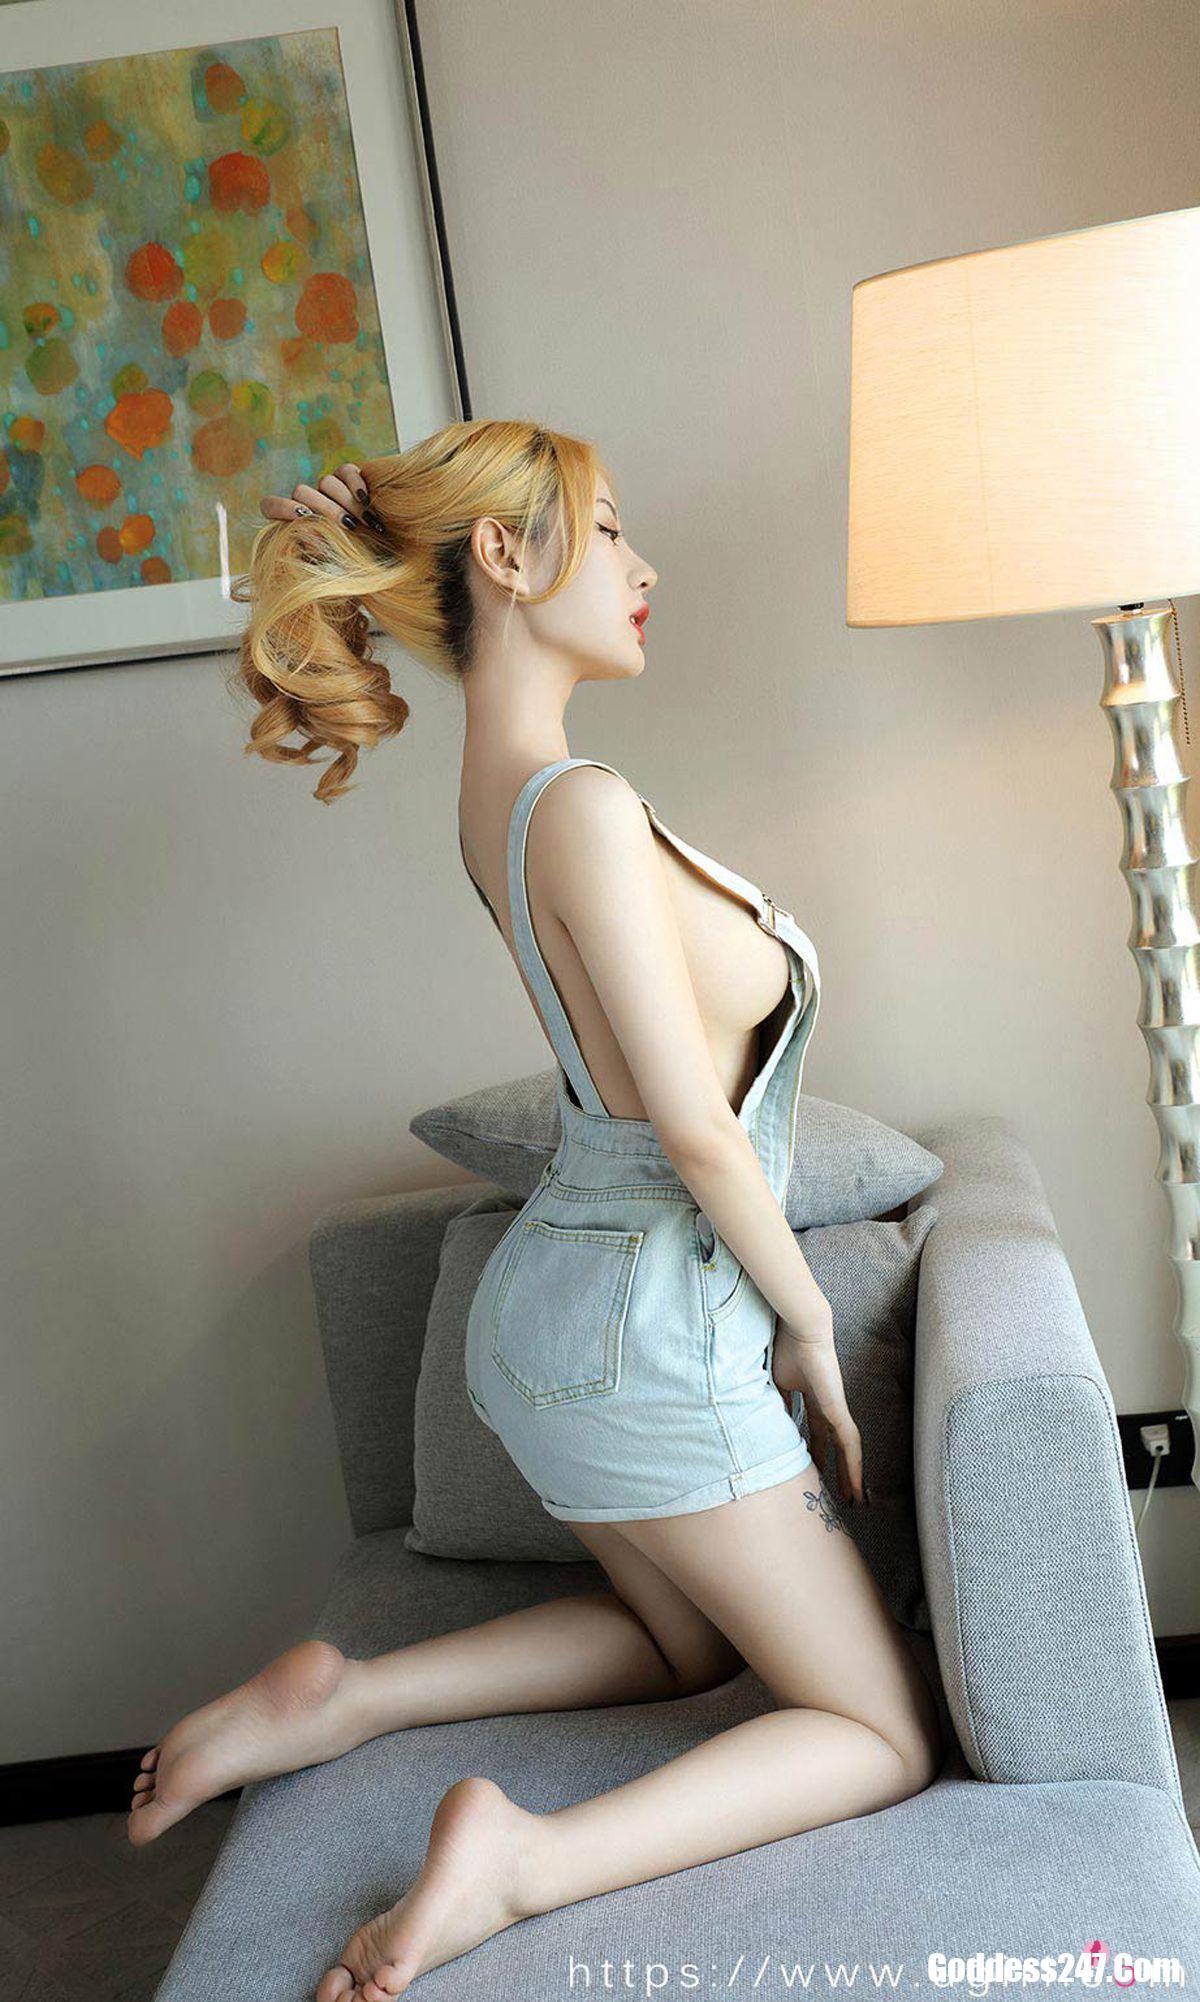 张欣欣, Zhang Xin Xin, Ugirls App尤果圈 No.2081 张欣欣, Ugirls App尤果圈 No.2081